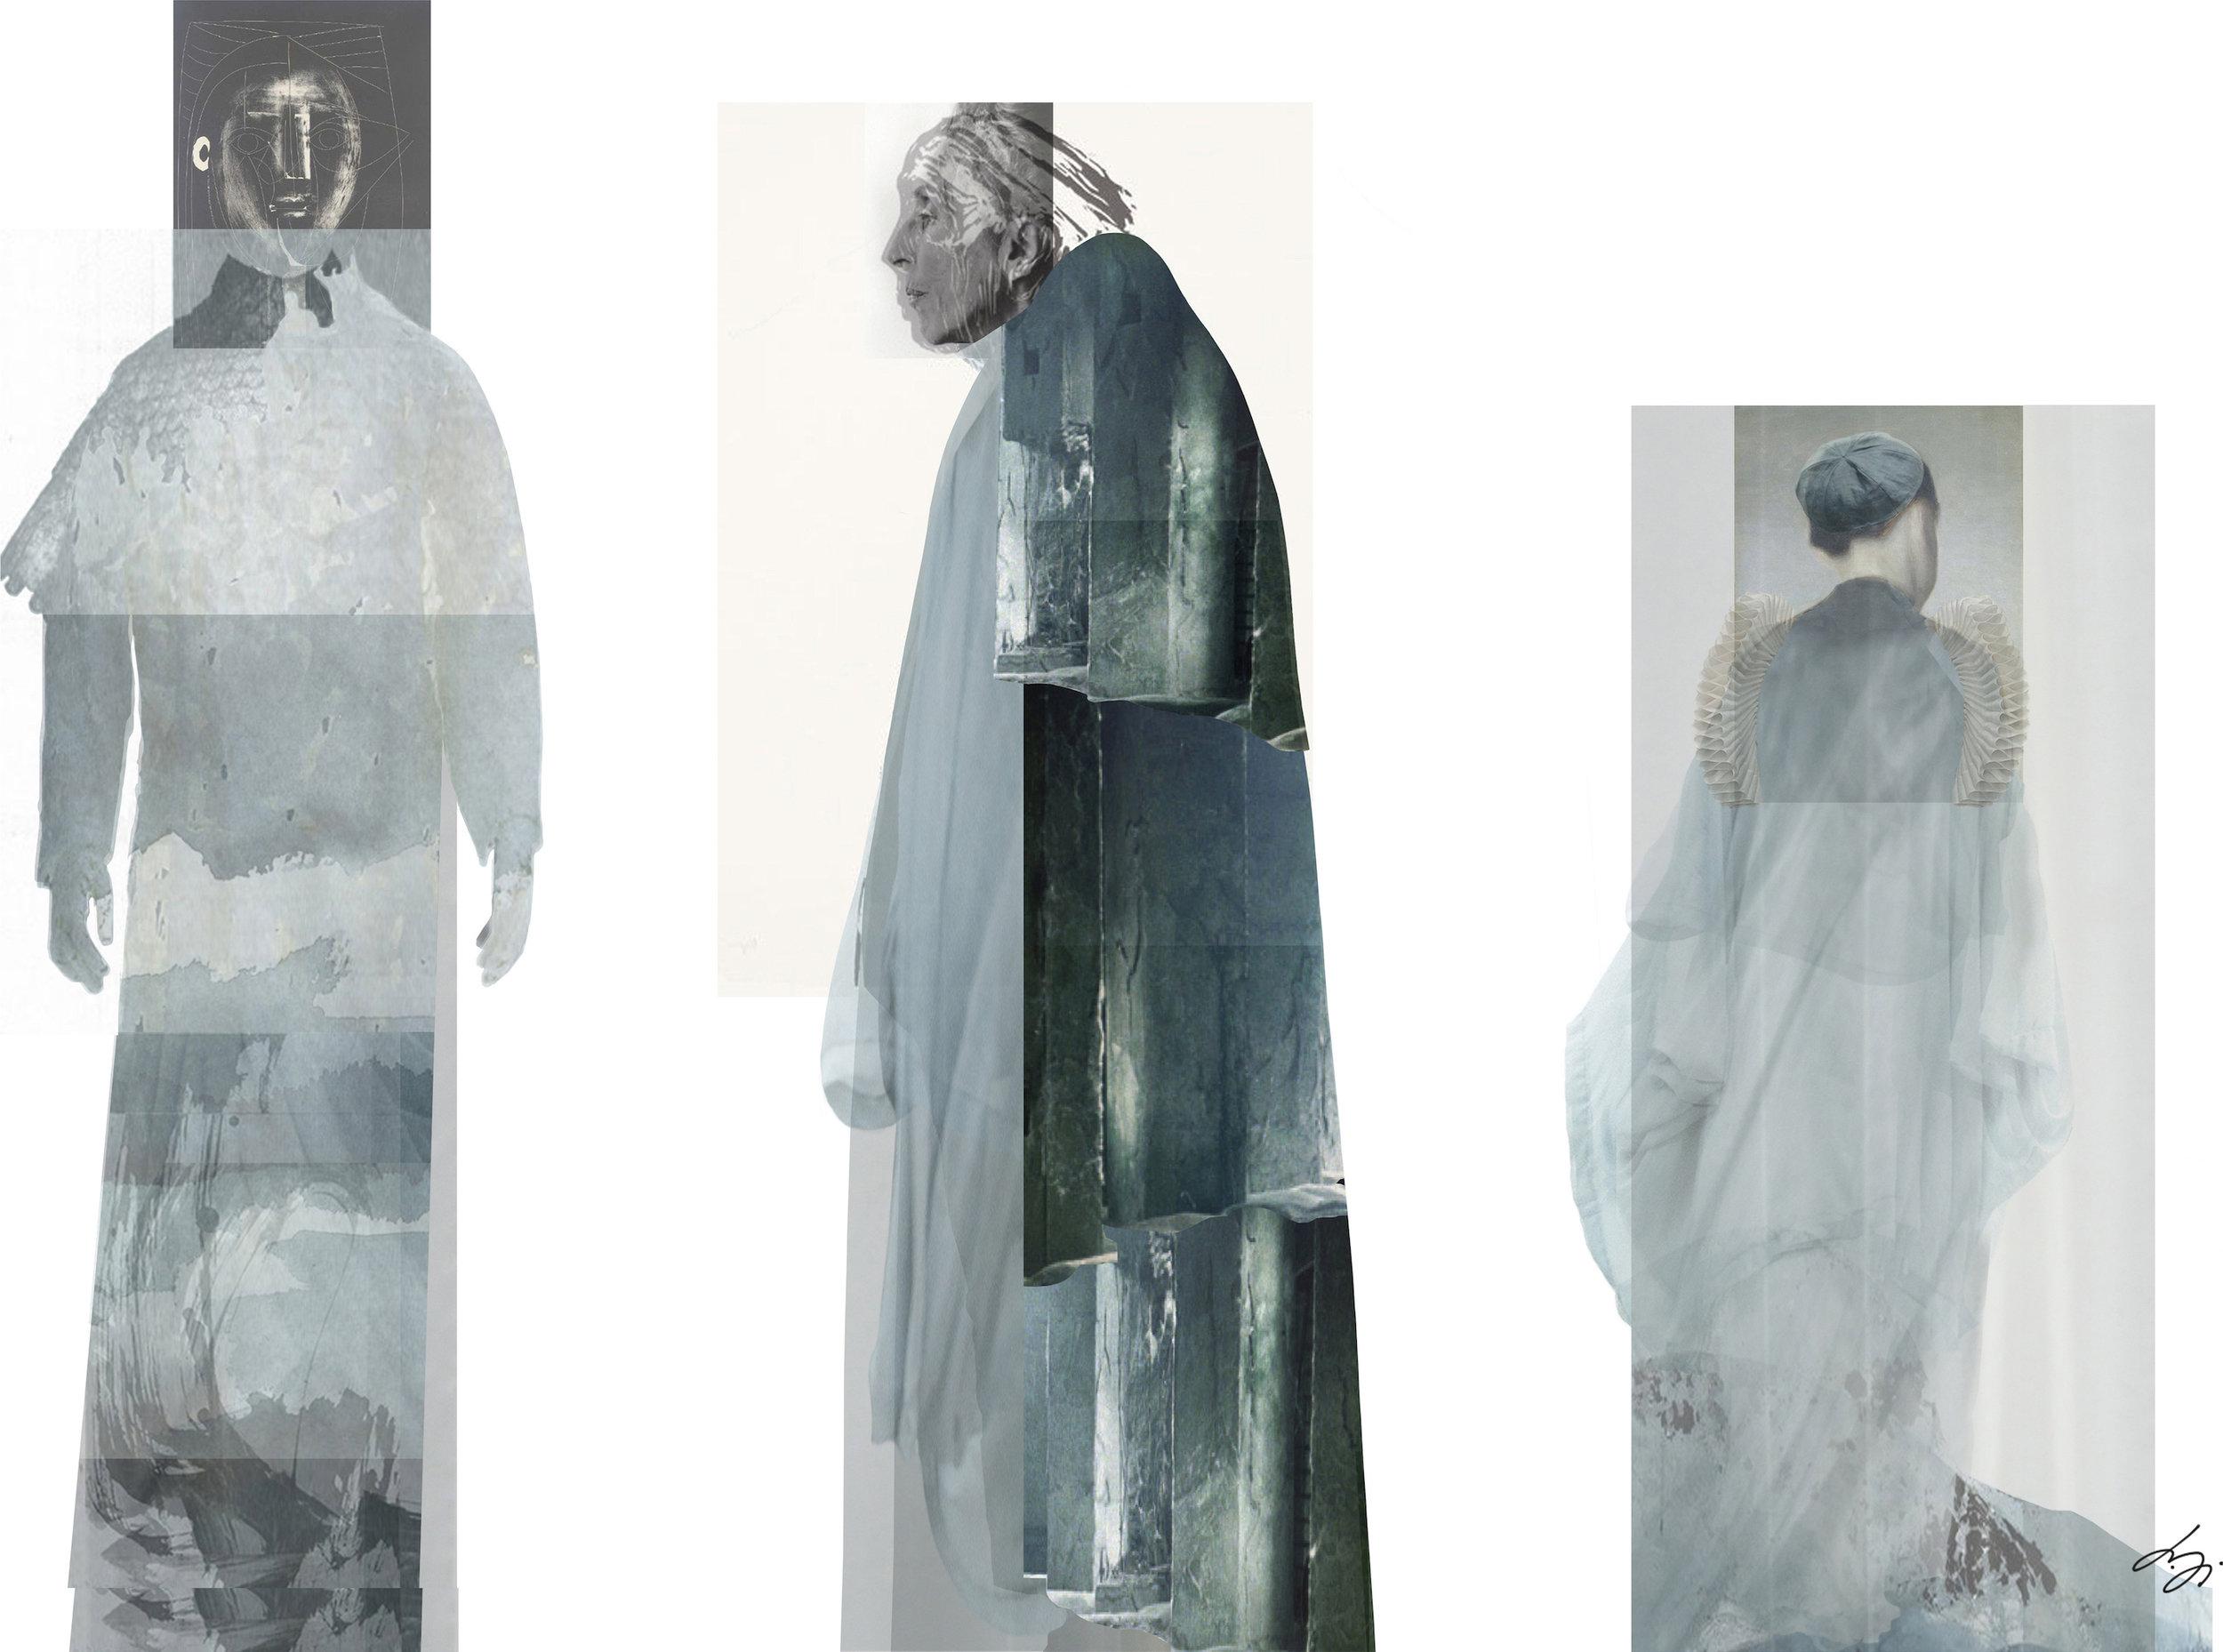 Costume collages (left to right) of Cerimon, Cloten, Iachimo, Imogen, Pericles, Prospero and Mamilius